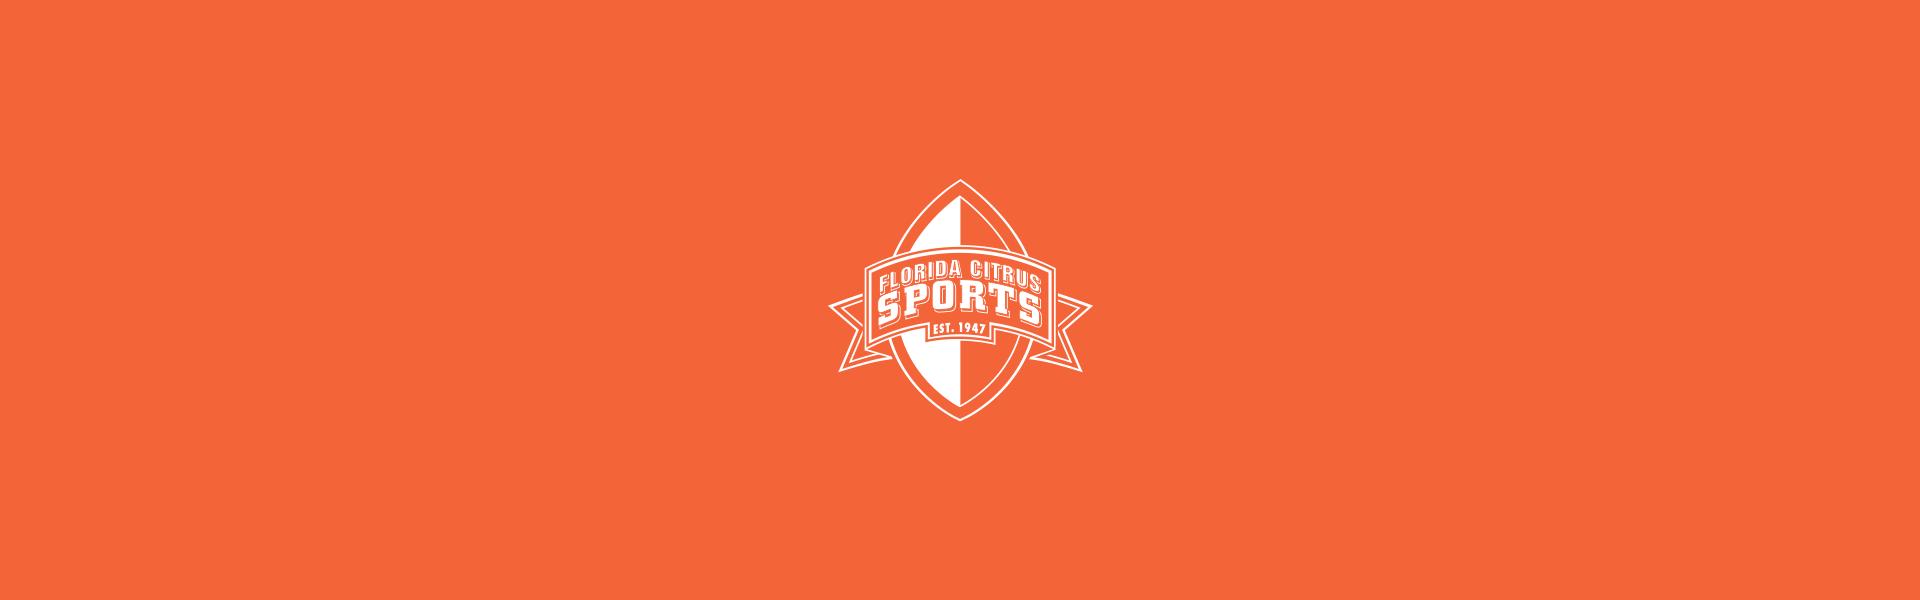 Florida Citrus Sports